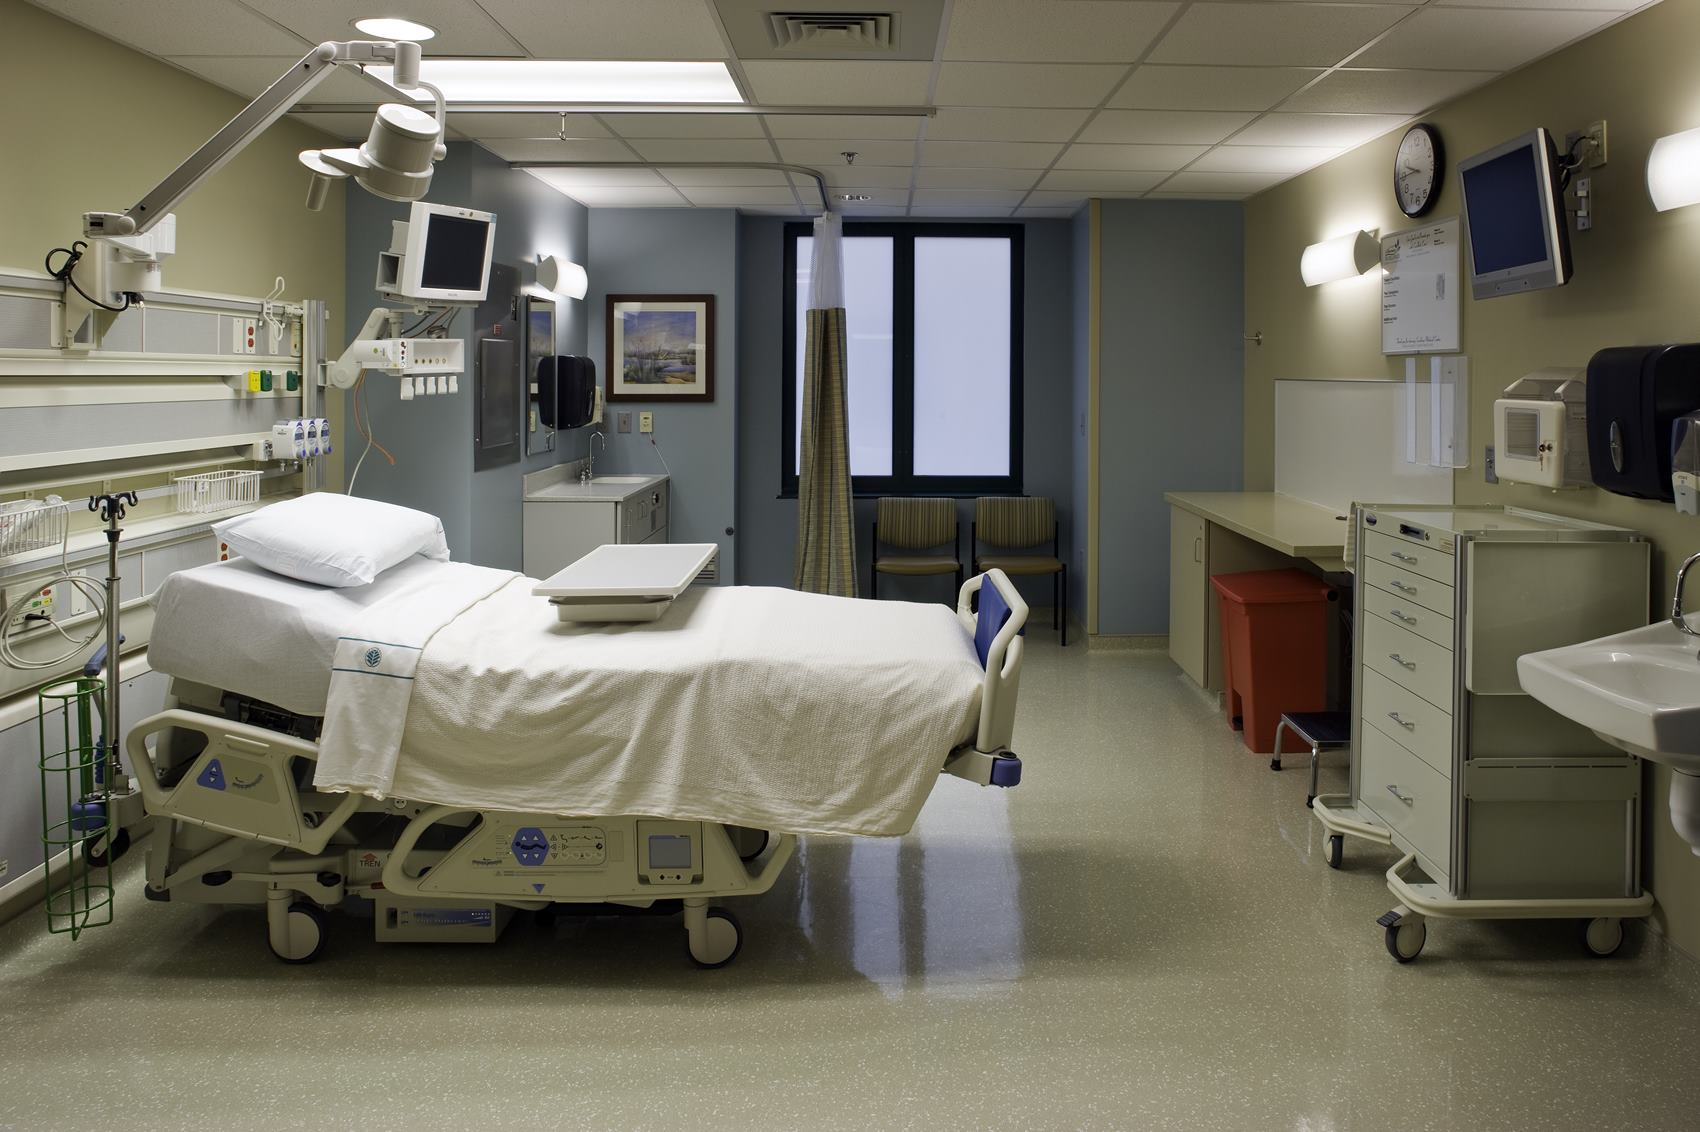 Intensive Care Unit at Carolinas Medical Center